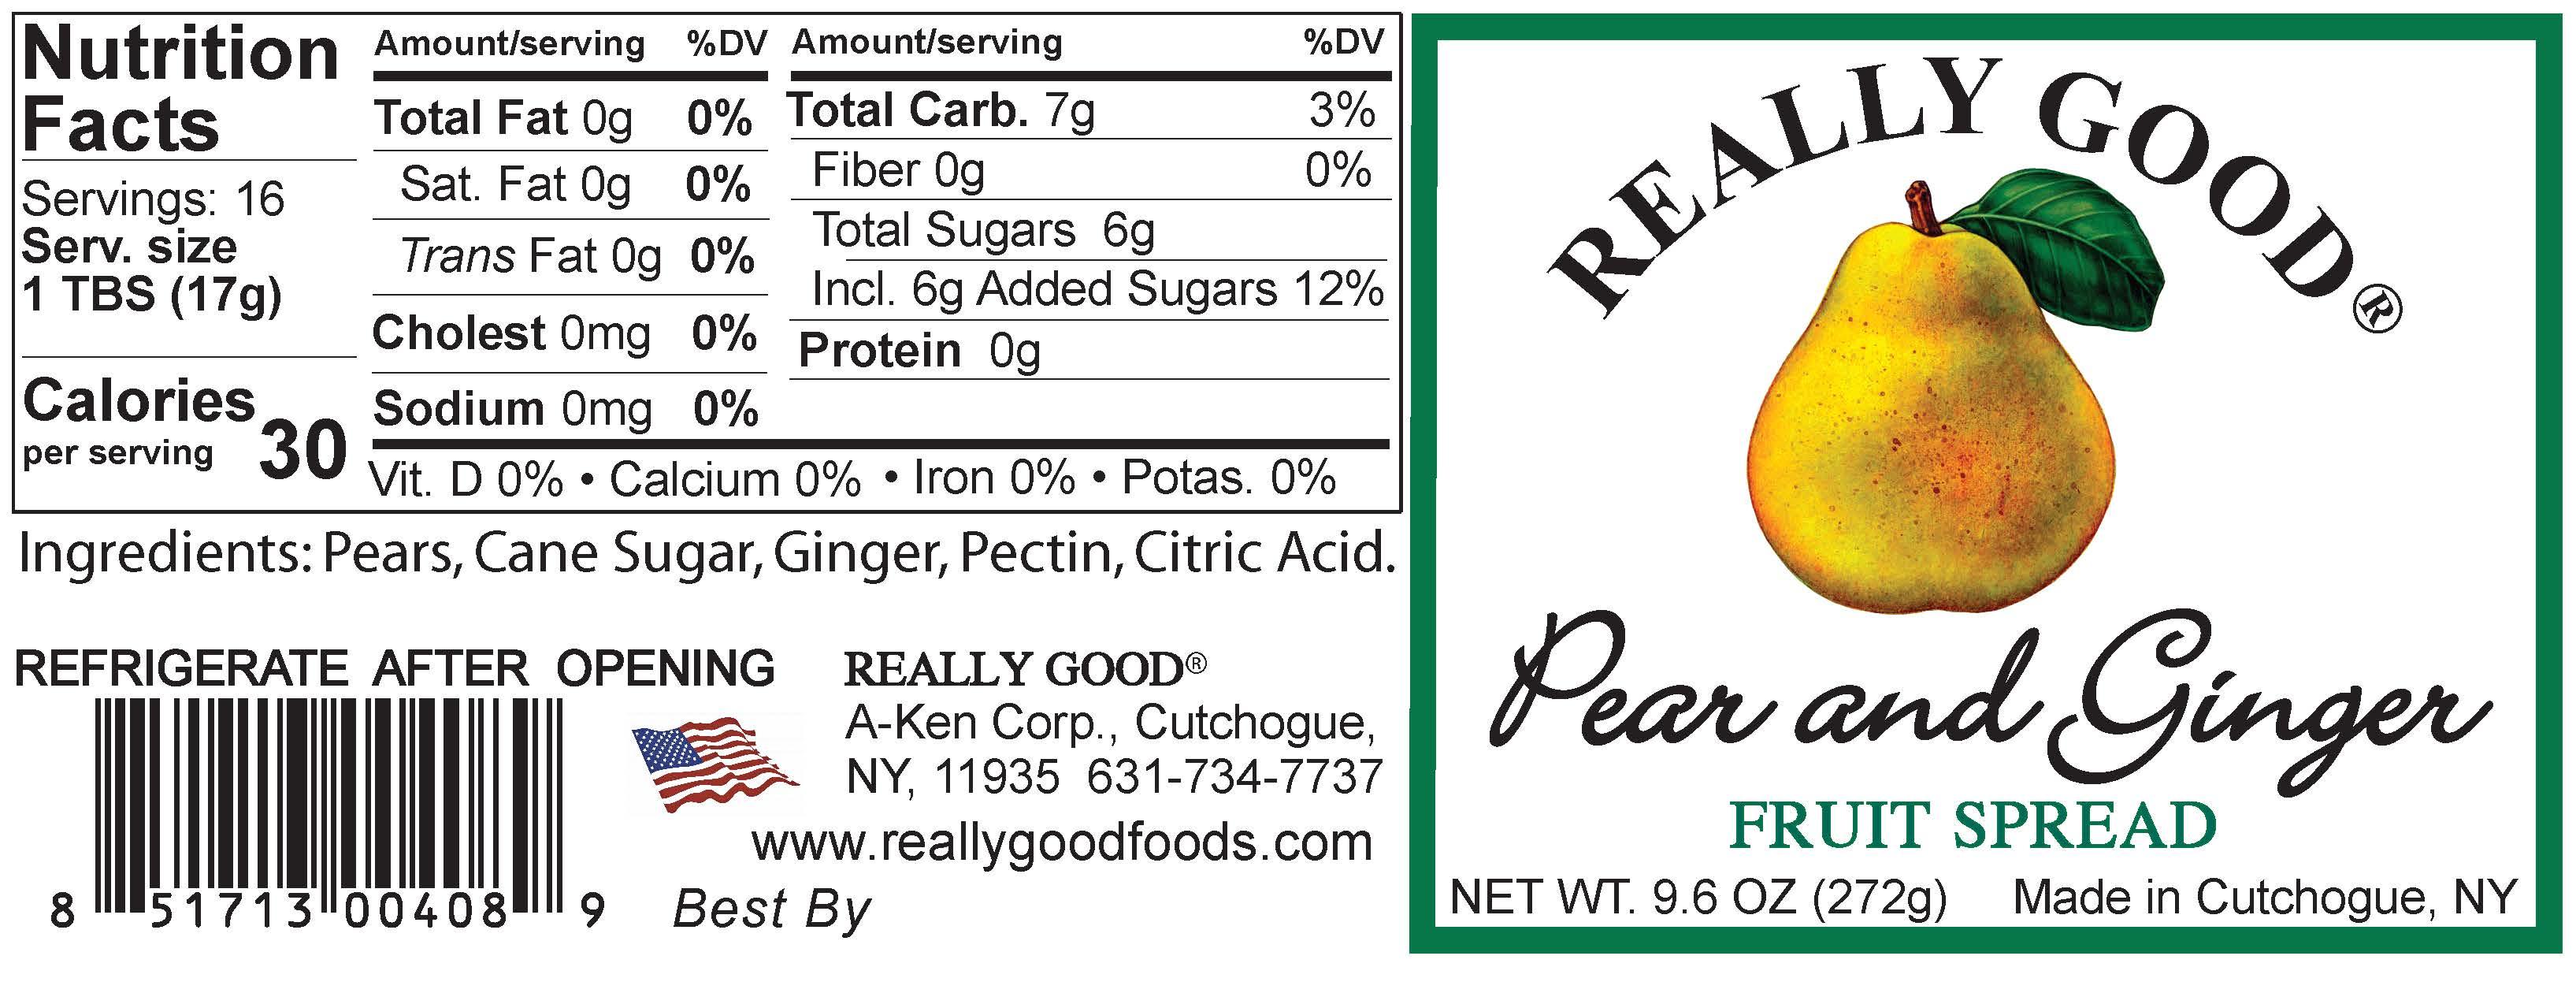 pear-ginger-9.6oz-label.jpg